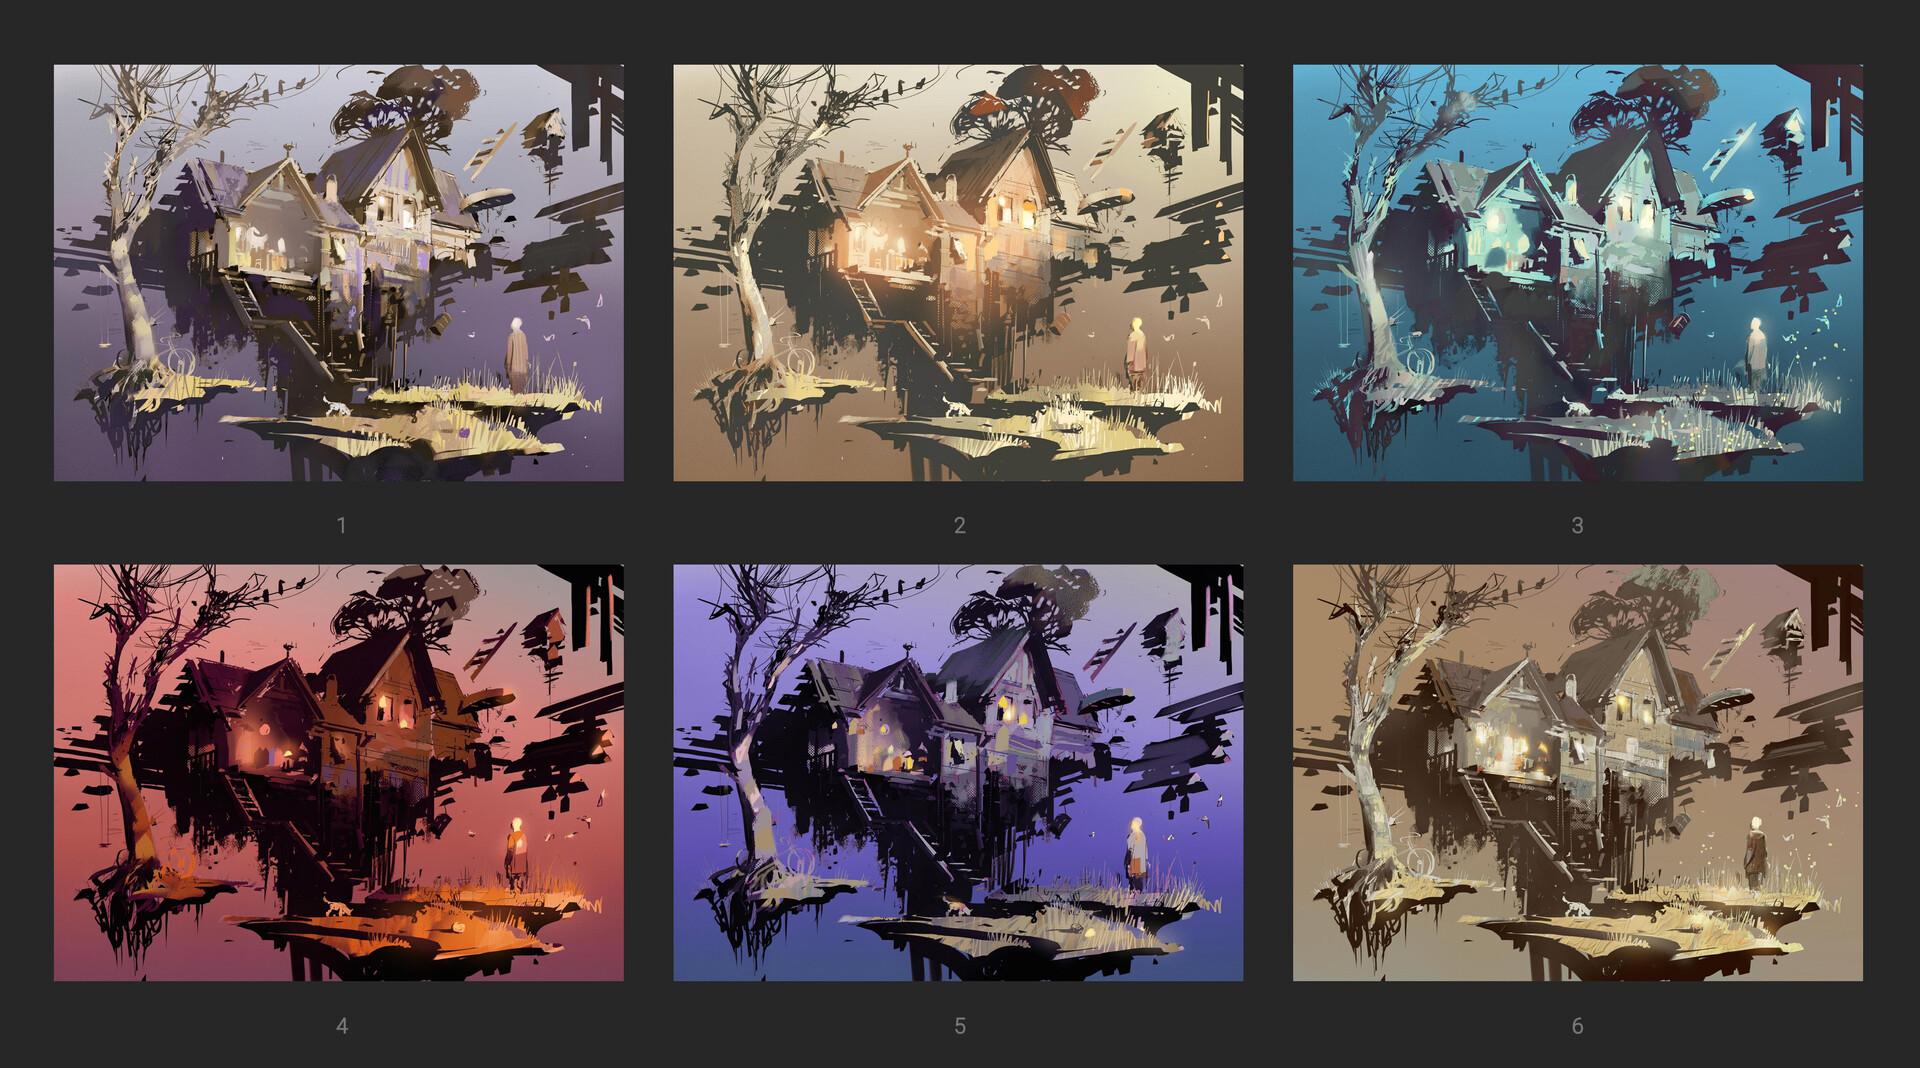 Pavel goloviy color sketches